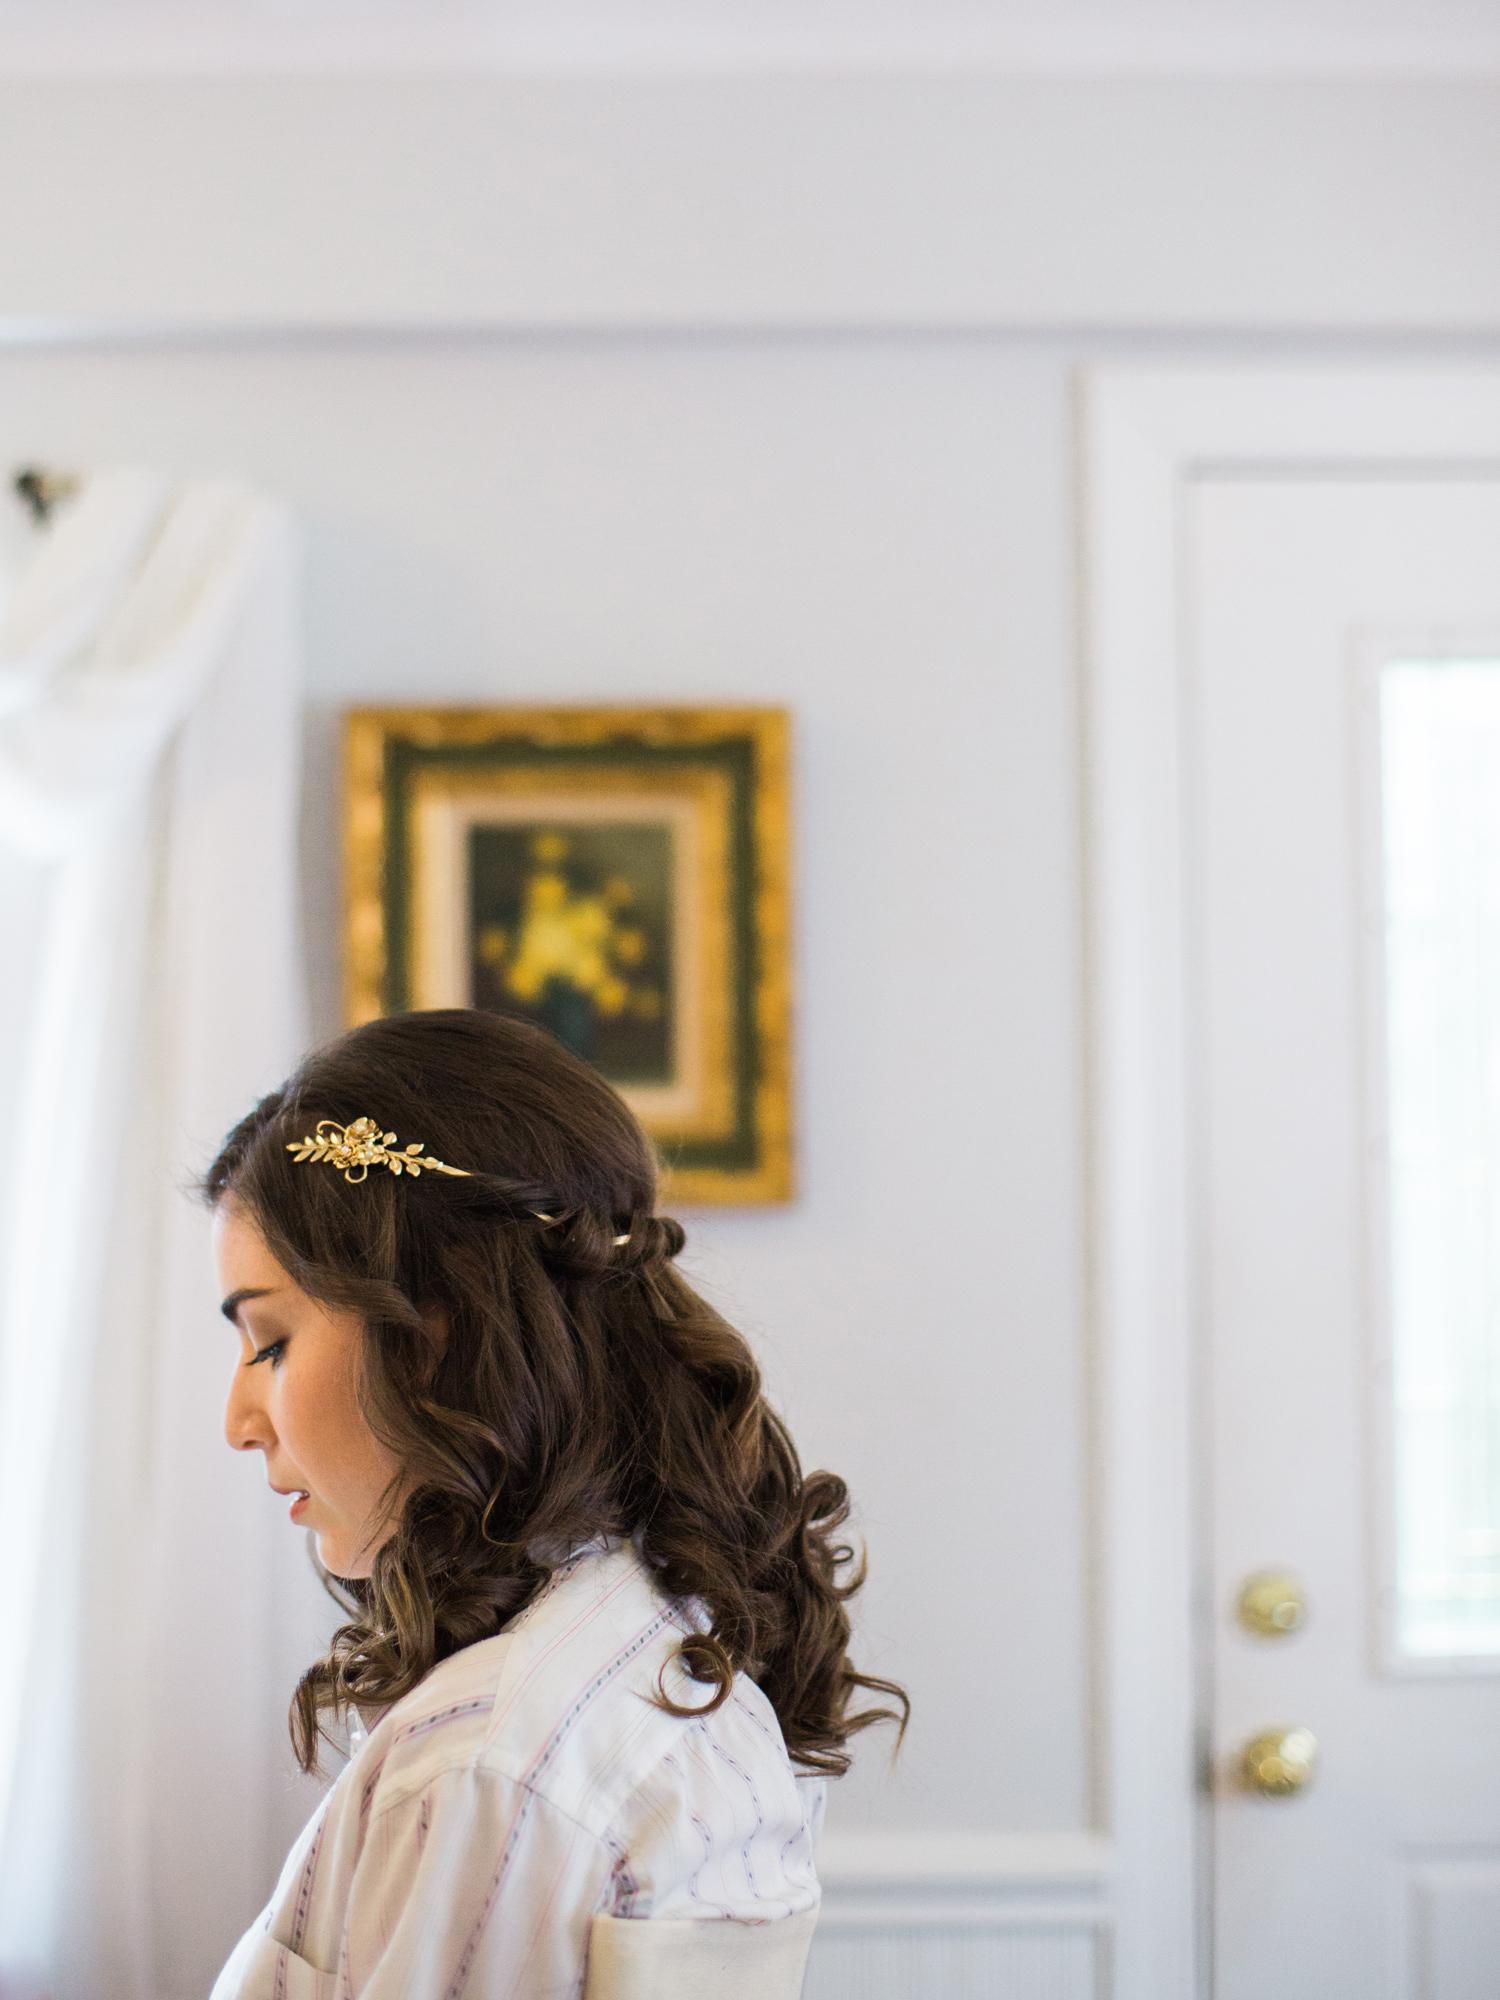 Siousca_Photography_Philadelphia_wedding_Photographer_Holly_Hedge_estate_new_hope_west_chester_4.jpg